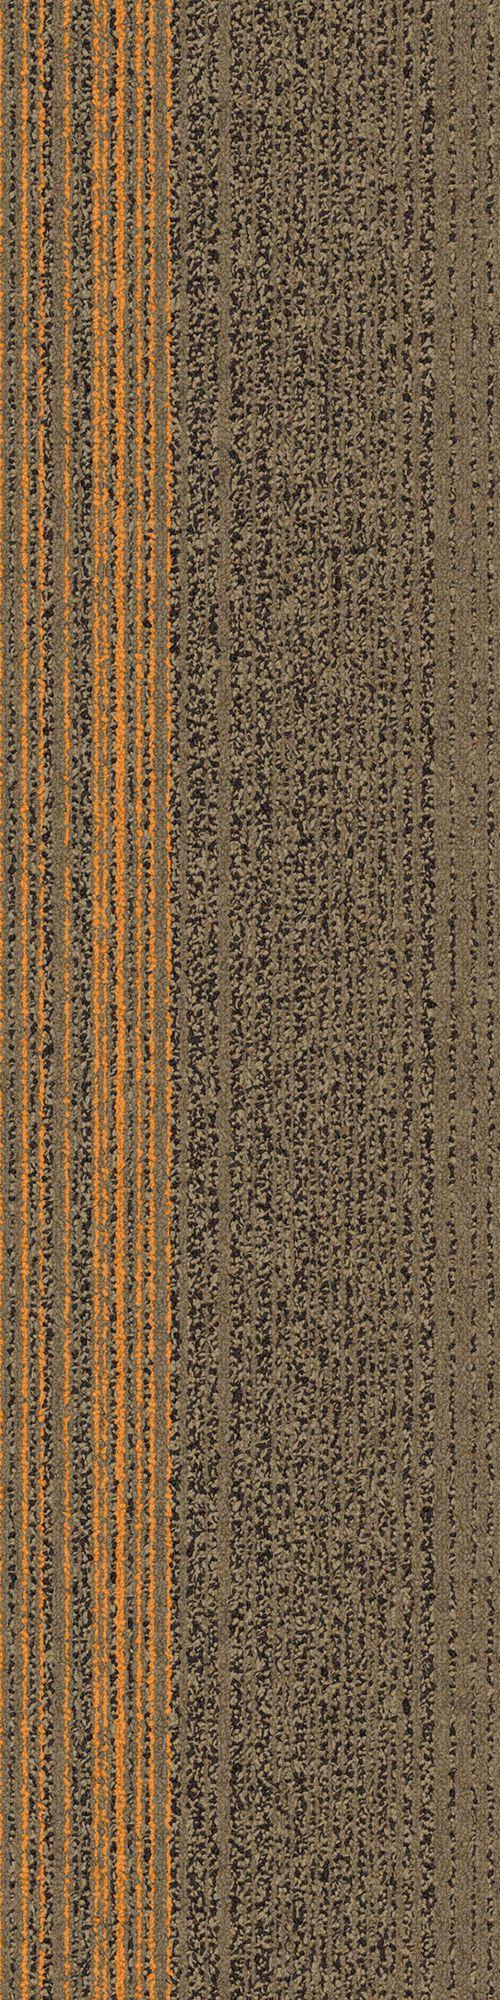 Interface carpet tile bp411 color name toffeeorange variant 1 interface carpet tile bp411 color name toffeeorange variant 1 baanklon Gallery